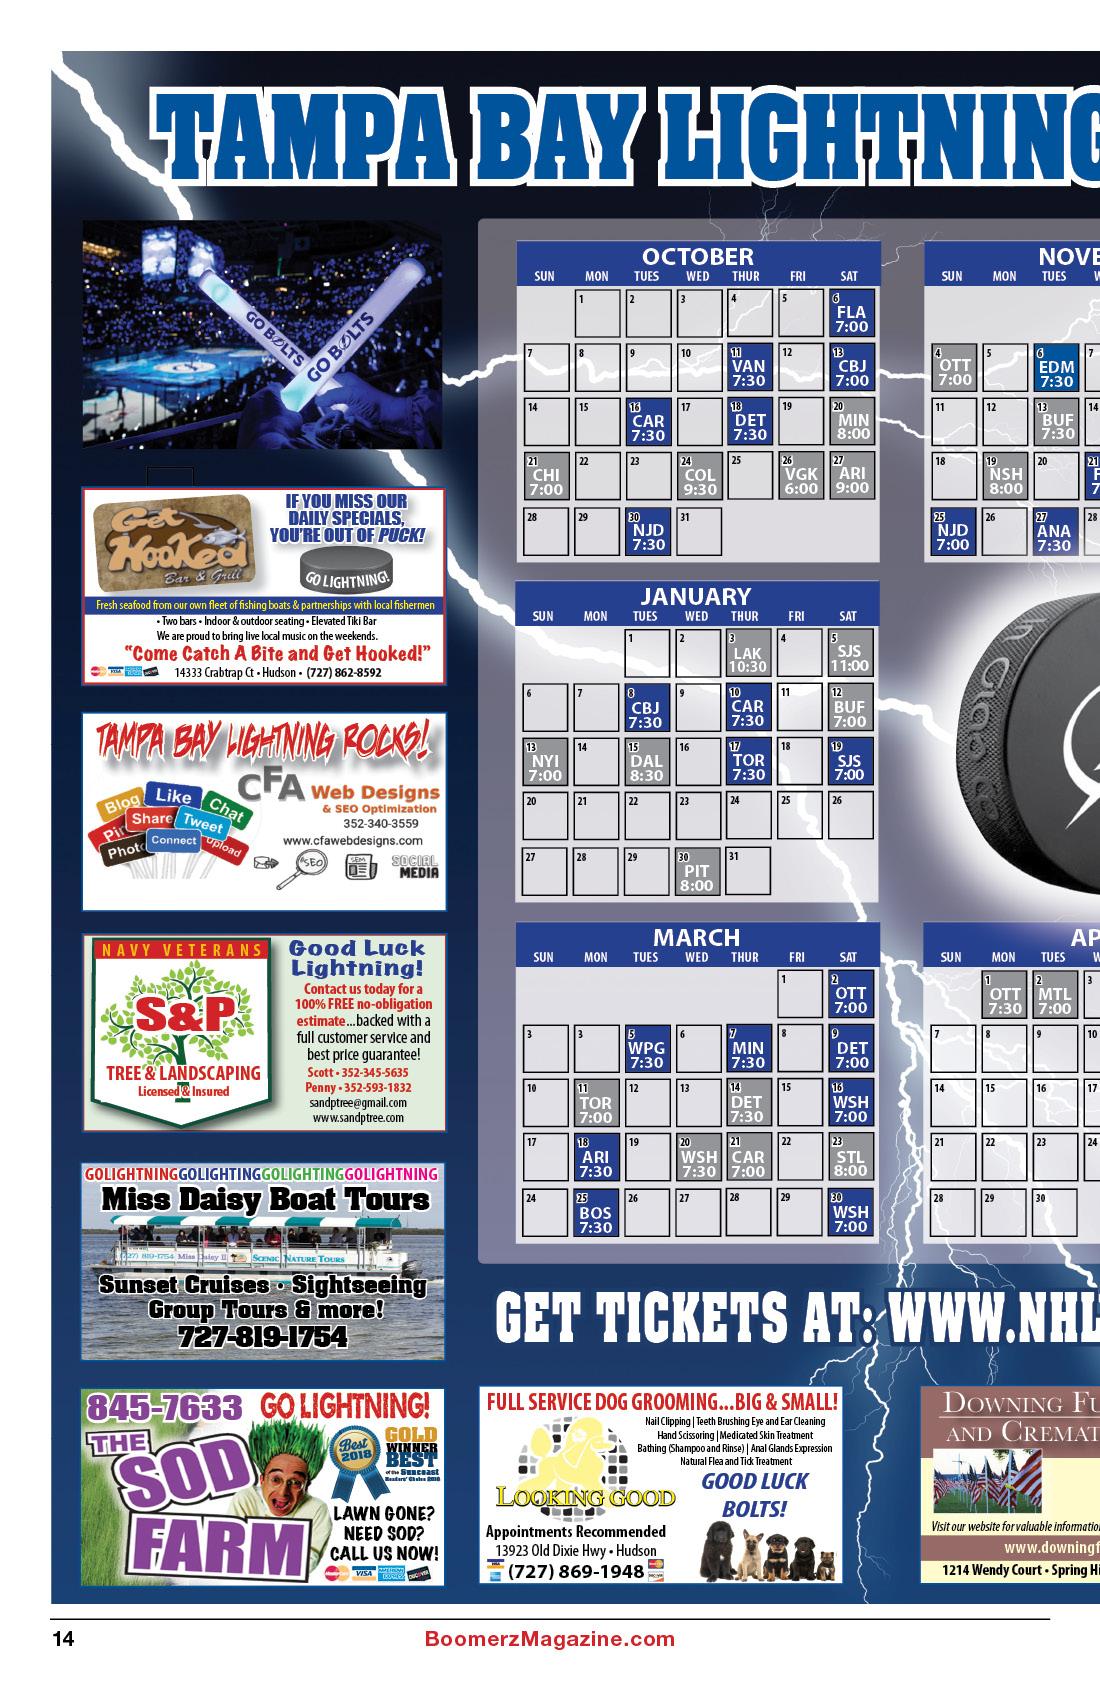 2018 October Boomerz Magazine Page 14 Tampa Bay Lighting Schedule